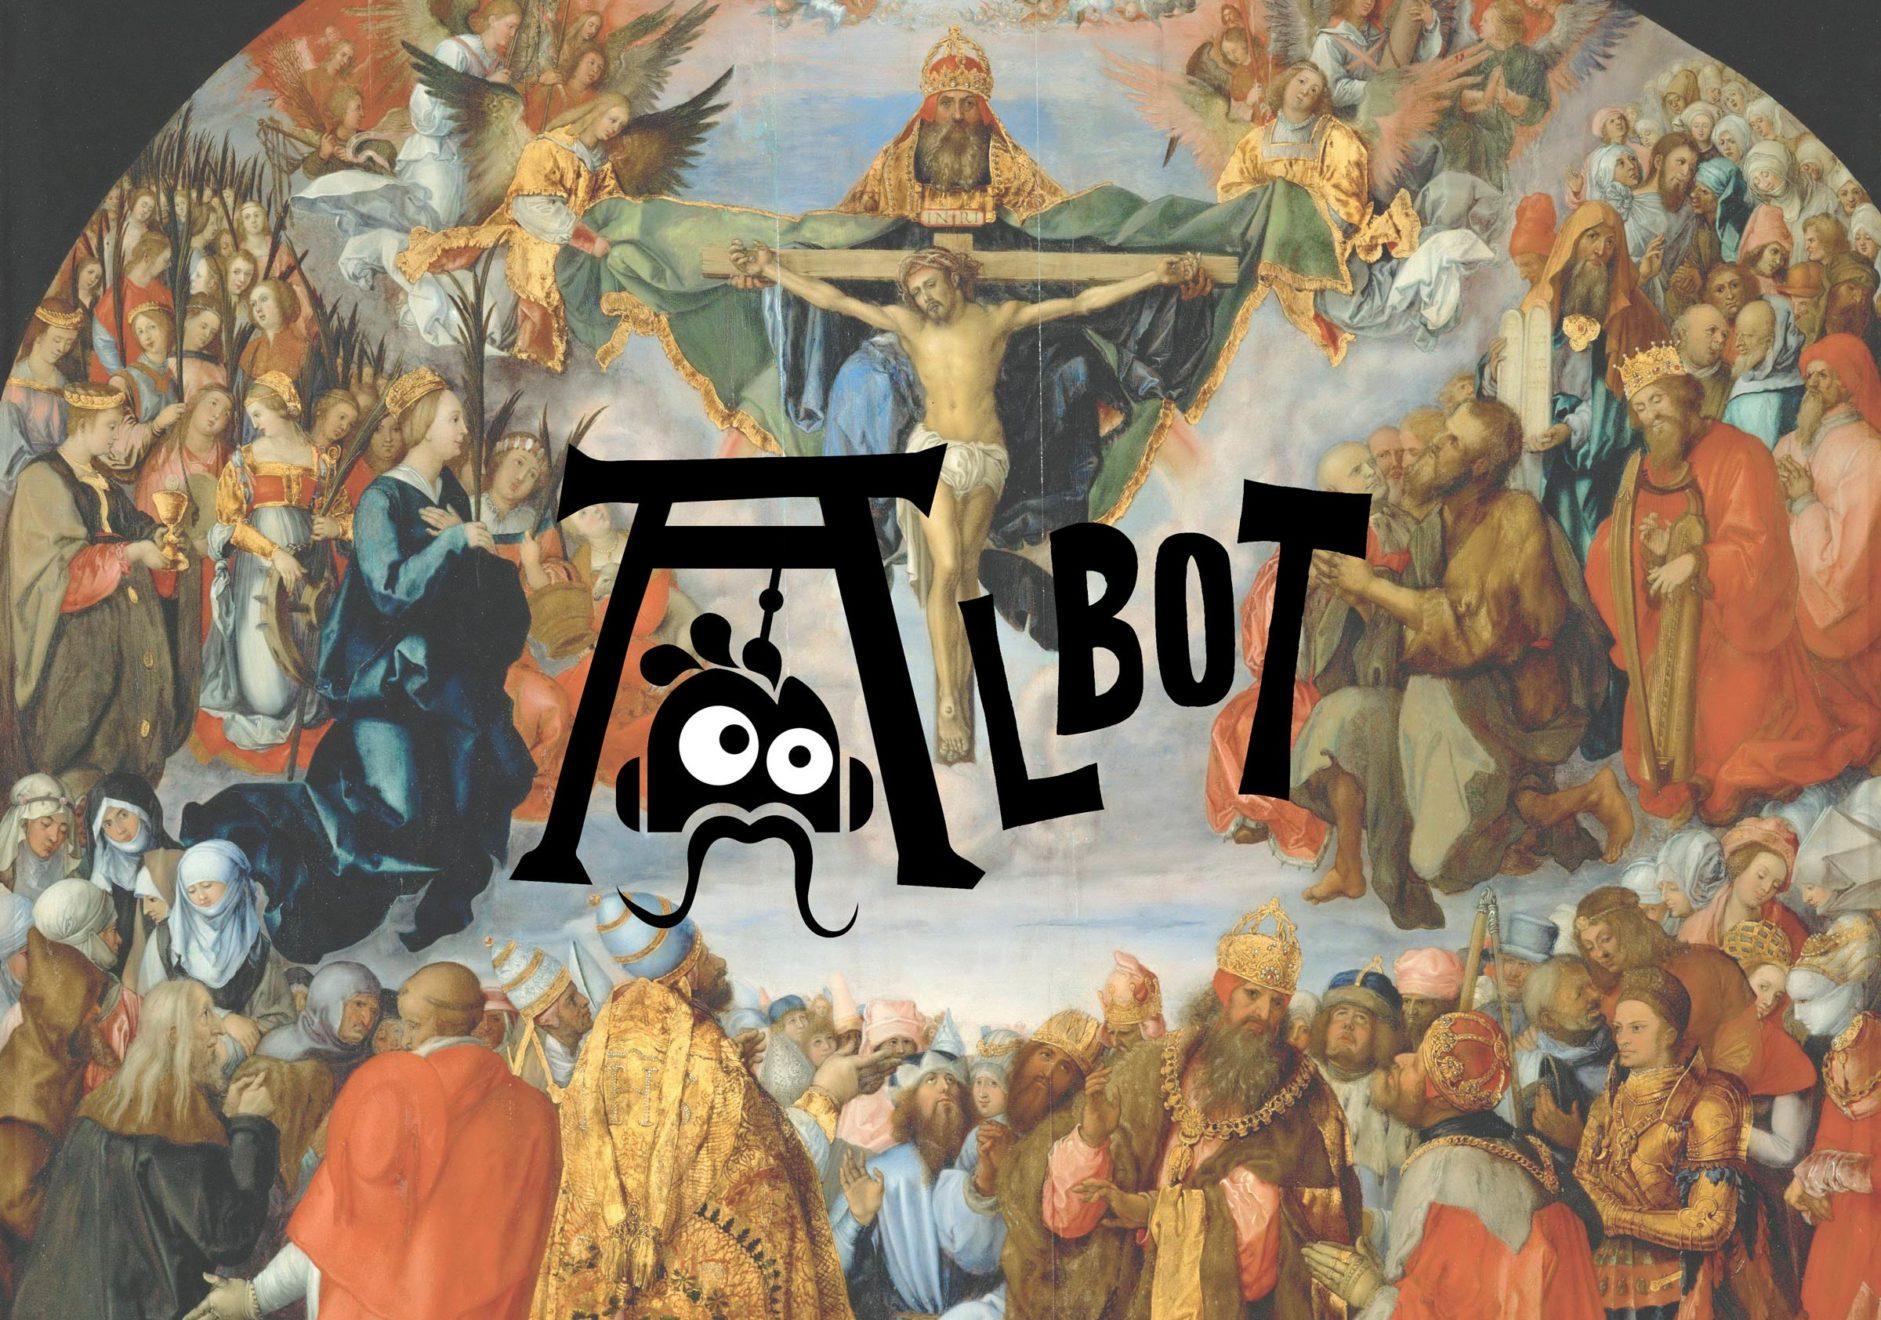 Albot – The Art History Chatbot